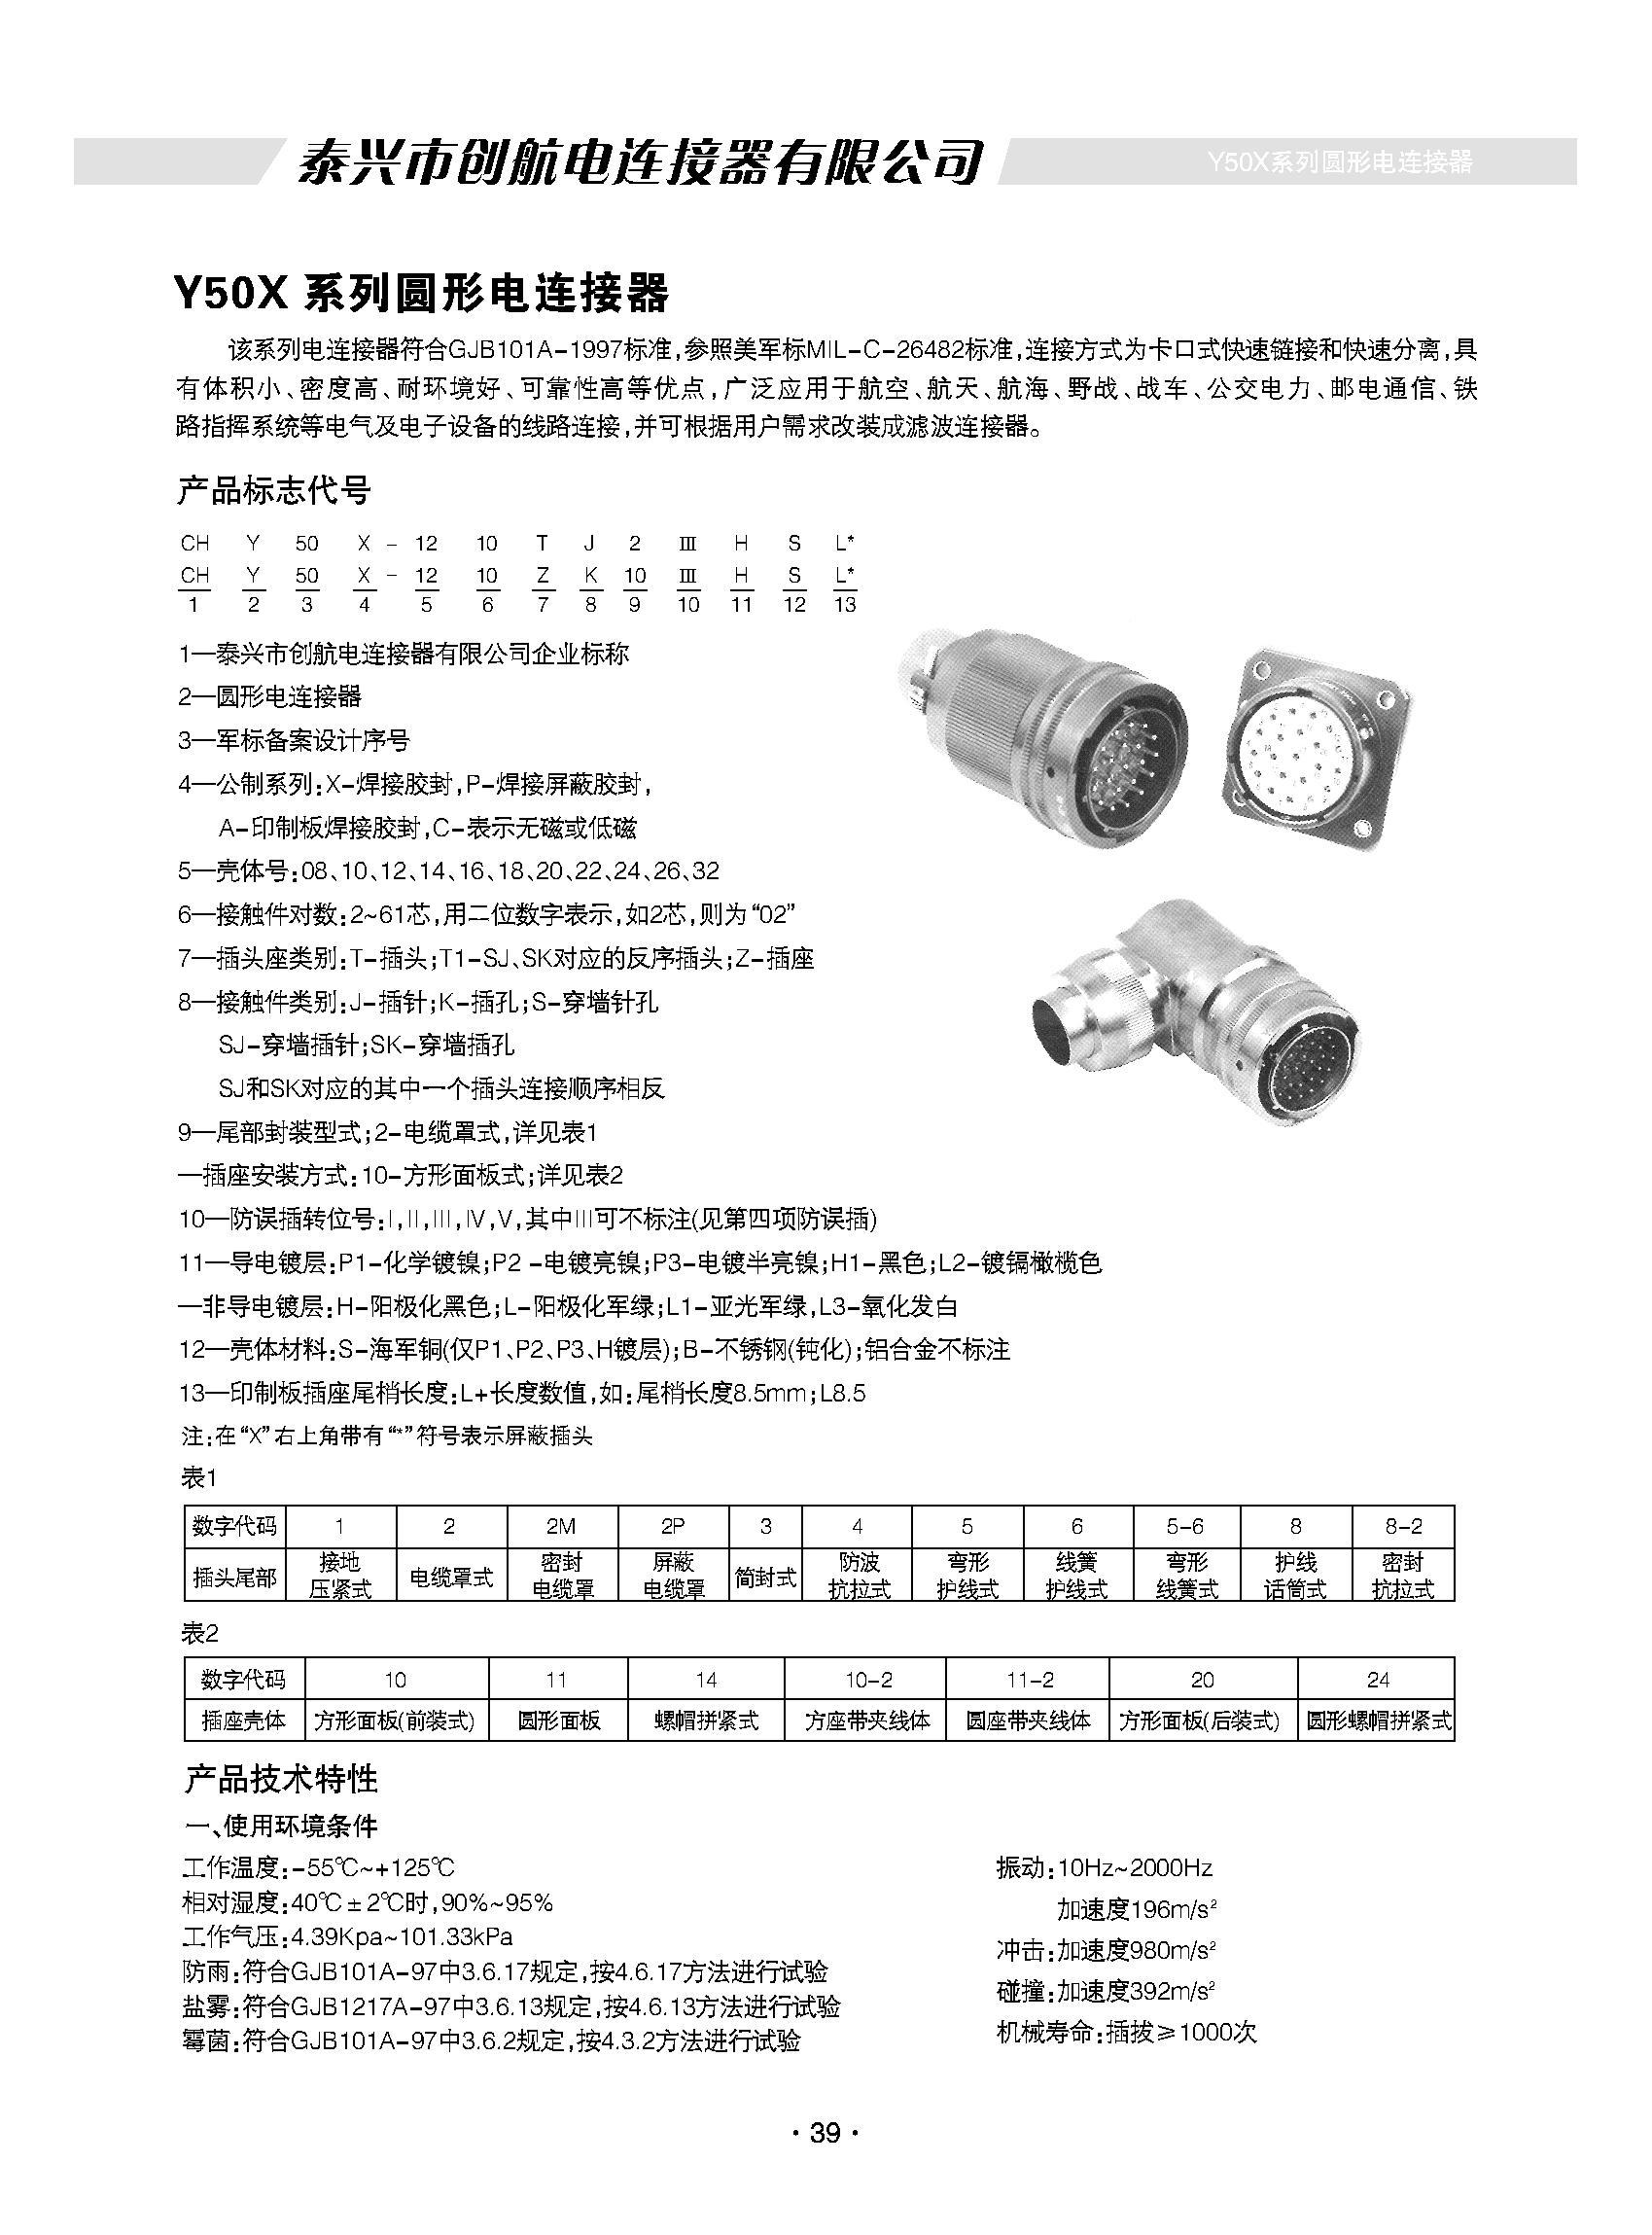 Y50X系列特种军用防水圆形航空插头、电连接器、接插件